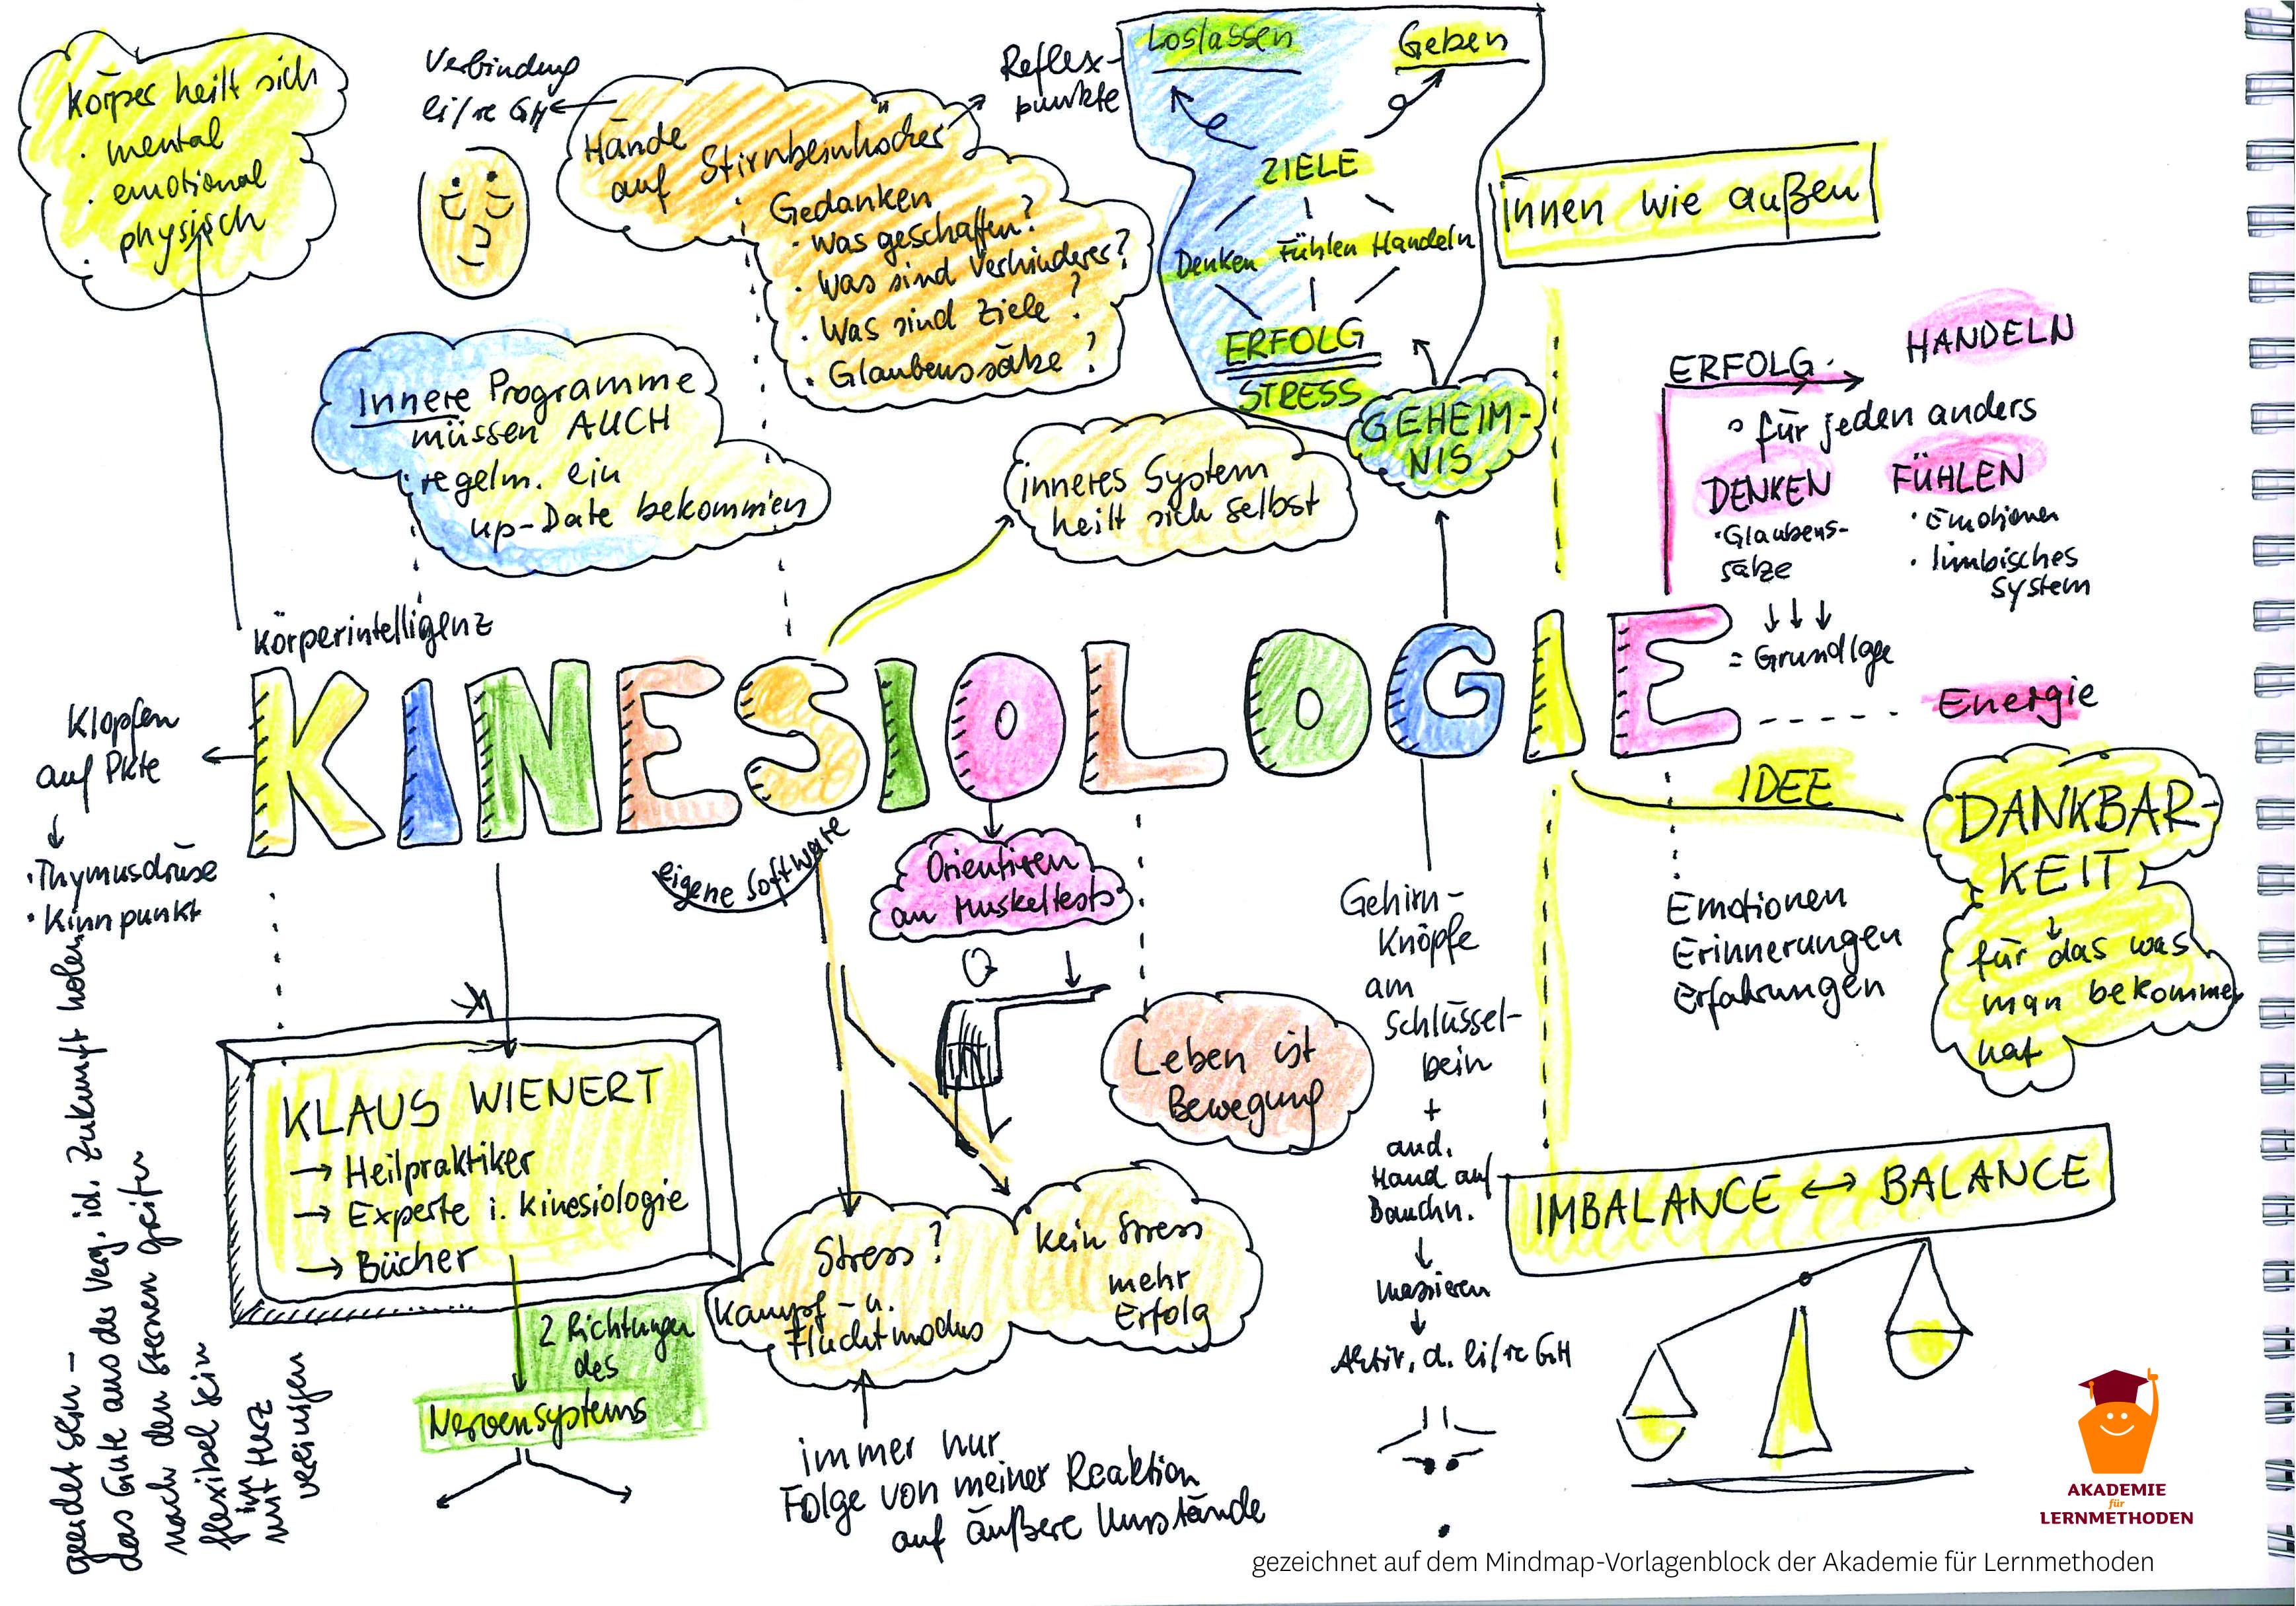 KAWA-Seminar-Mitschrift, Thema: Kinesiologie